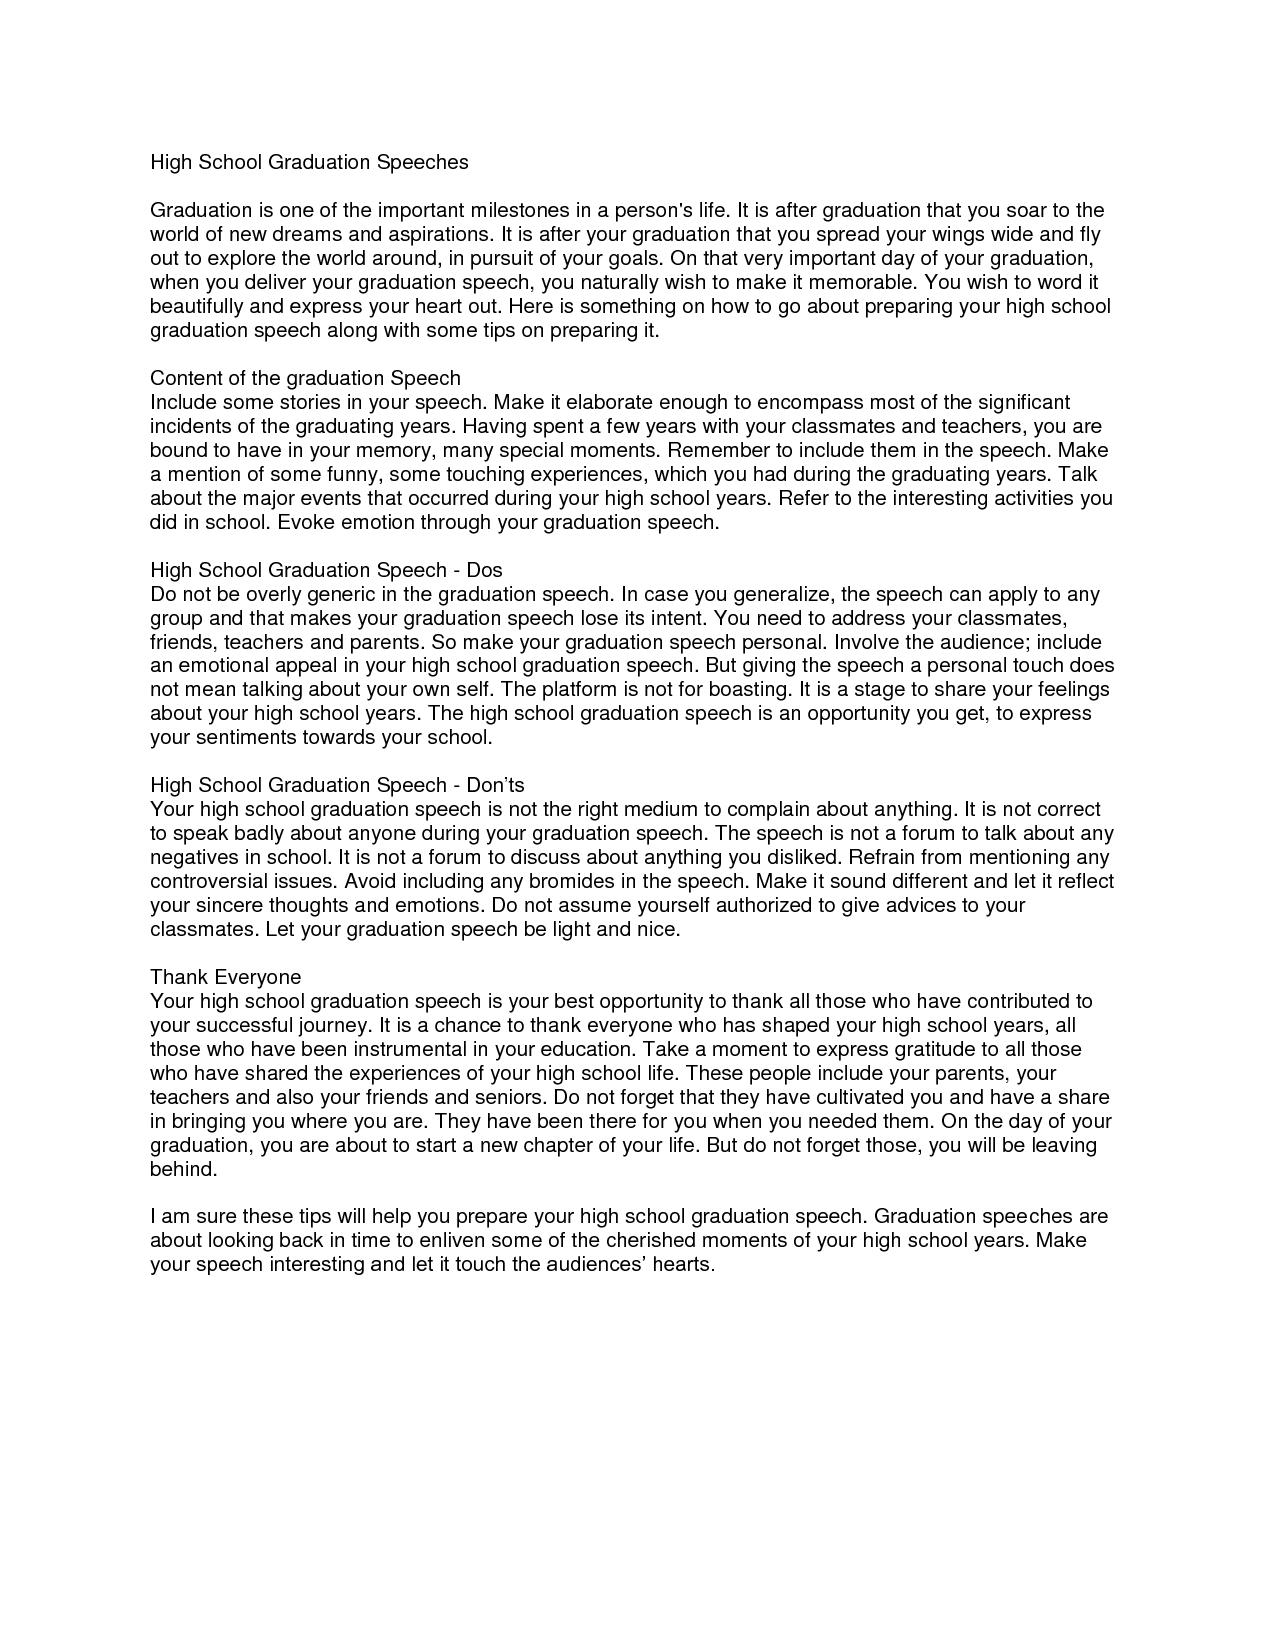 High School Principal Graduation Speech Examples